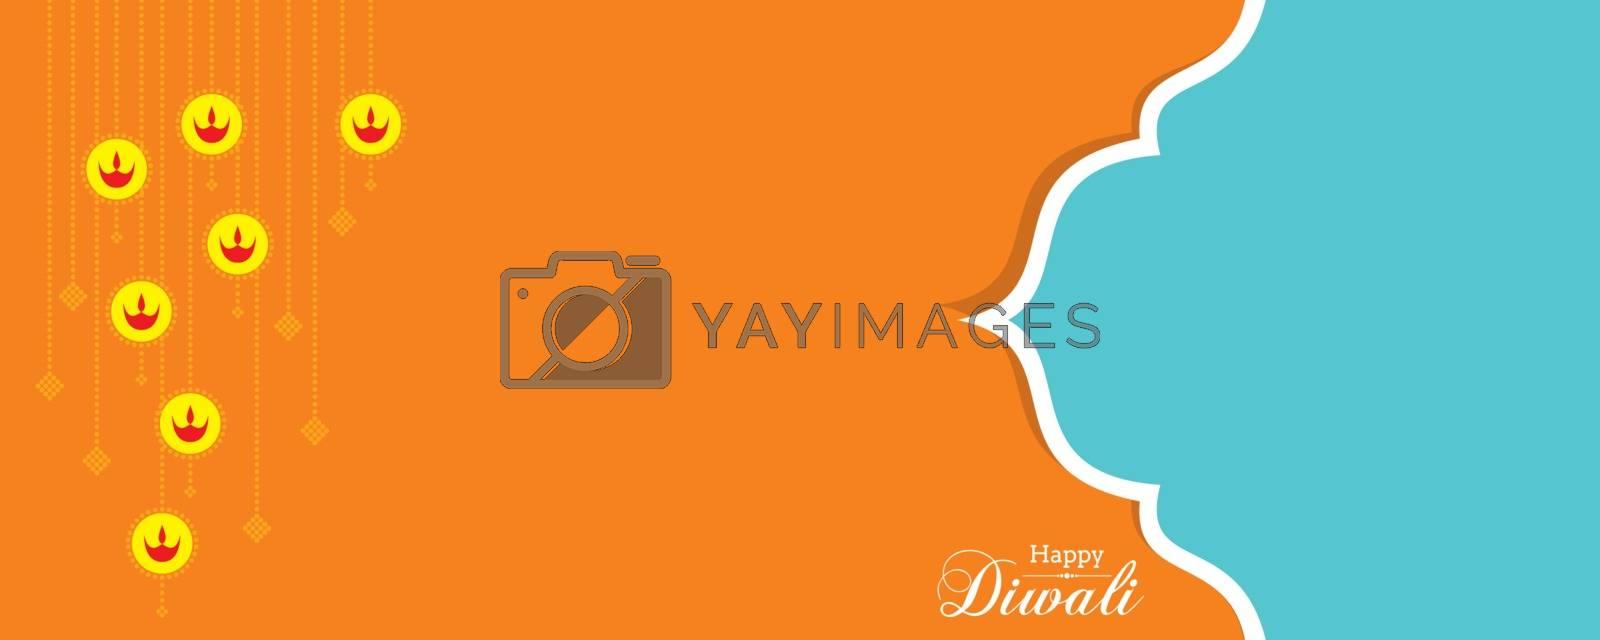 Illustration of Greeting for Diwali Celebration stock vector